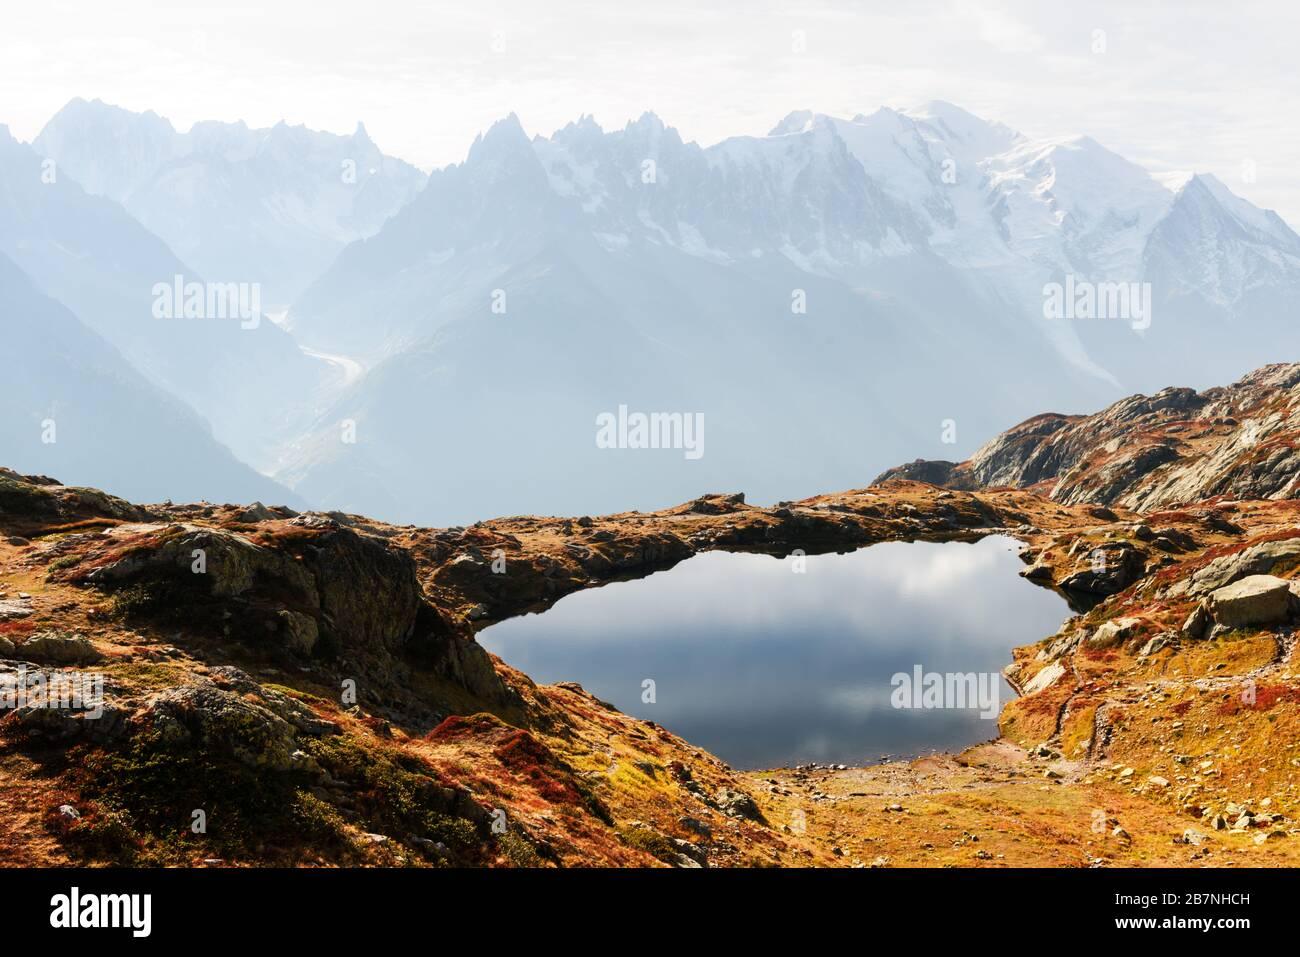 Colorido Paisaje otoñal con Chesery Lake (Lago De Cheserys) y Monte Bianco nevadas montañas gama en segundo plano. Vallon de Berard Nature Preserve, Chamonix, Francia Alpes Foto de stock